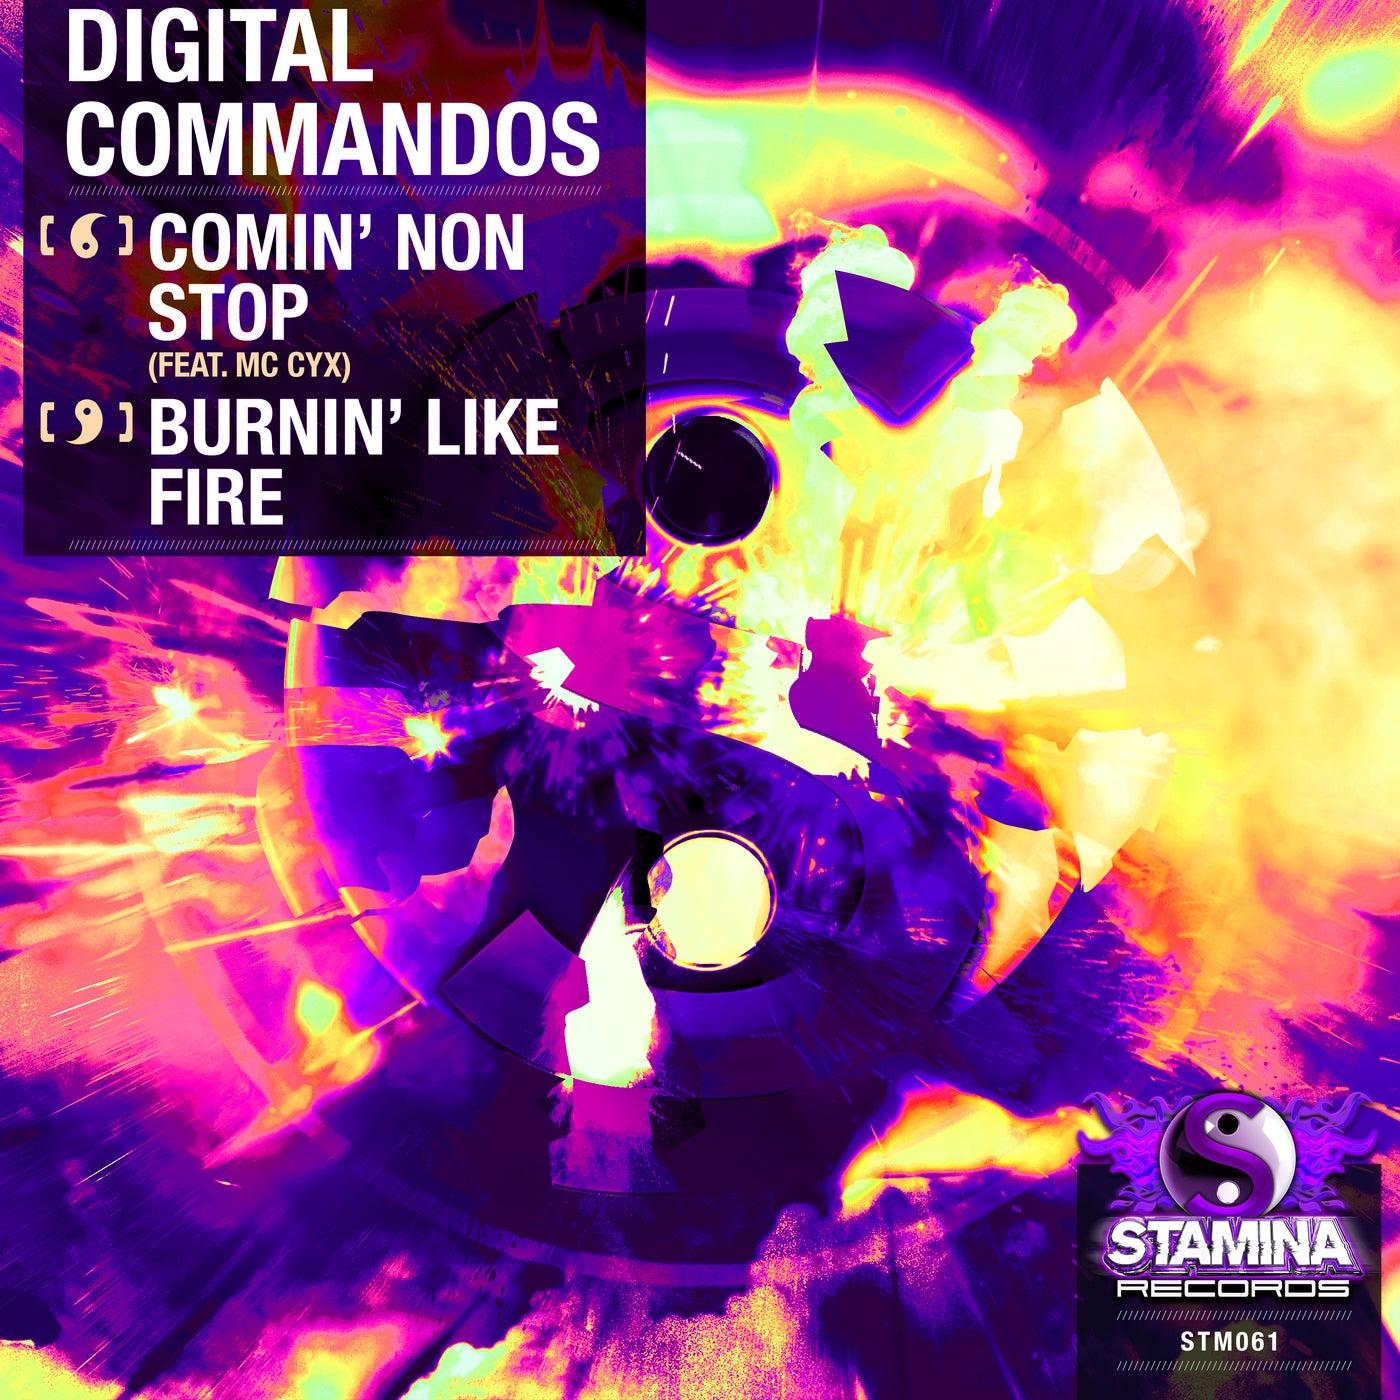 Burnin' Like Fire (Original Mix)